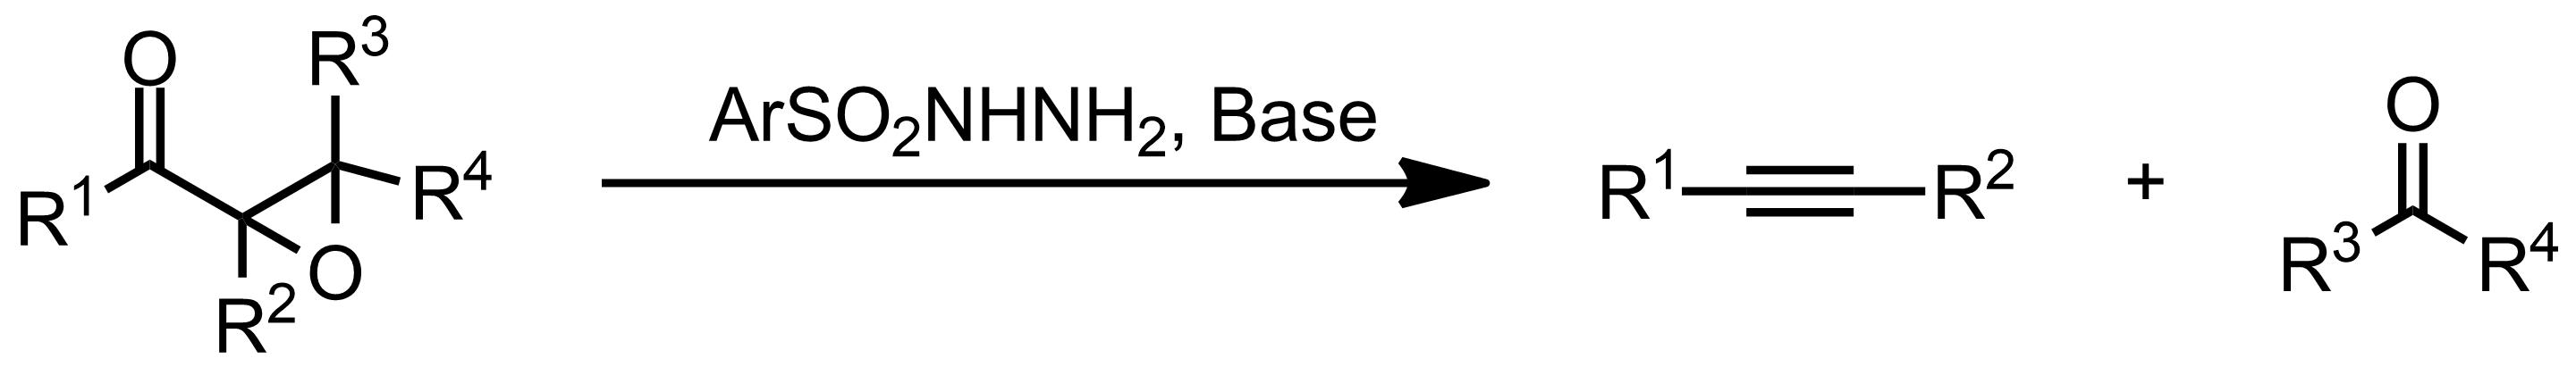 Schematic representation of the Eschenmoser Fragmentation.